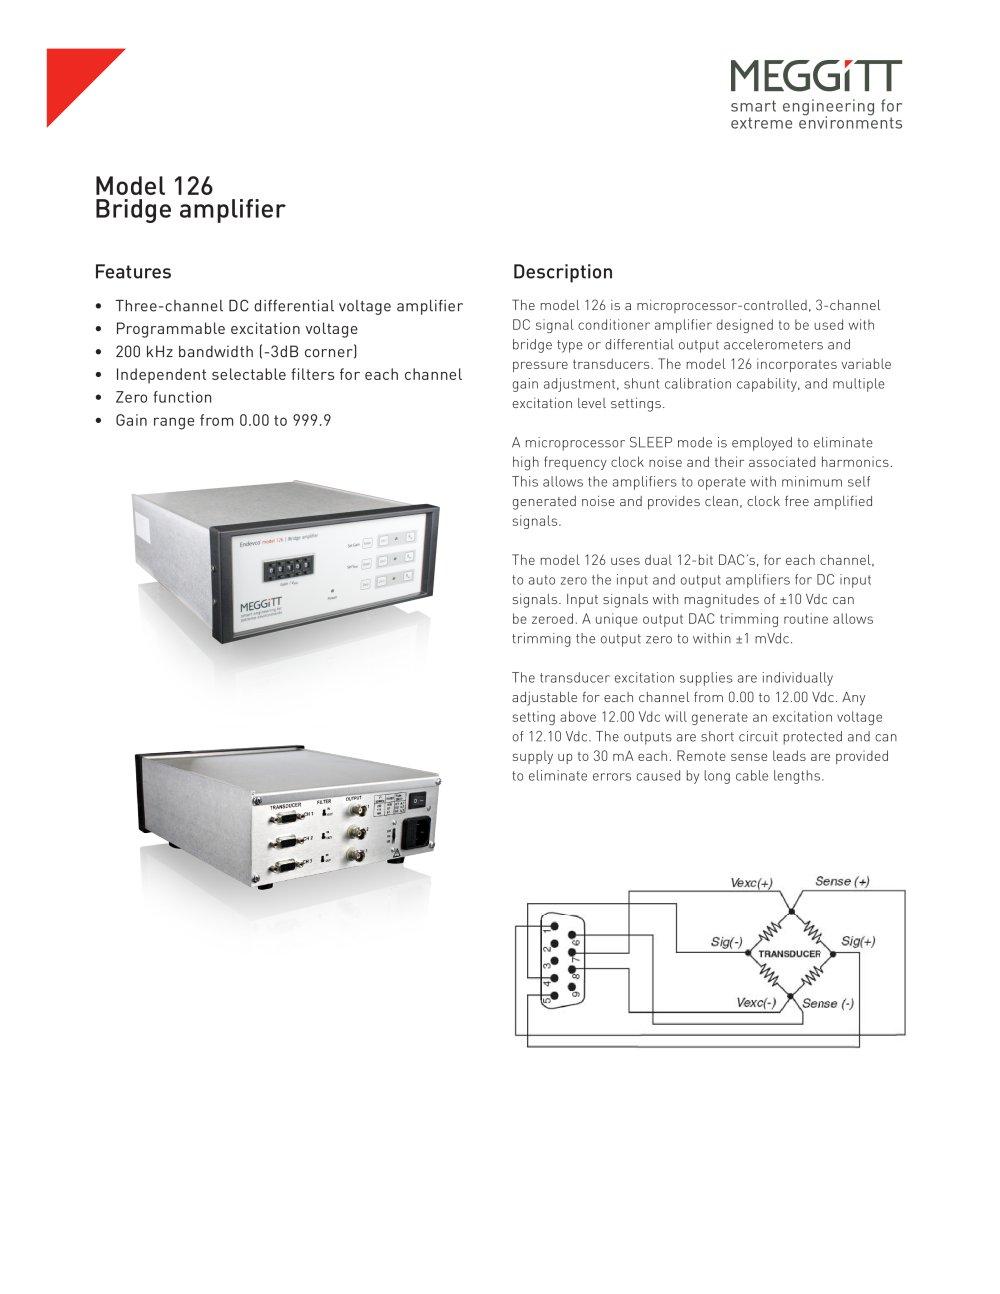 Endevco Model 126 3 Channel Dc Signal Conditioner Meggitt Sensing Linear Voltage Differential Transformer Design 1 2 Pages